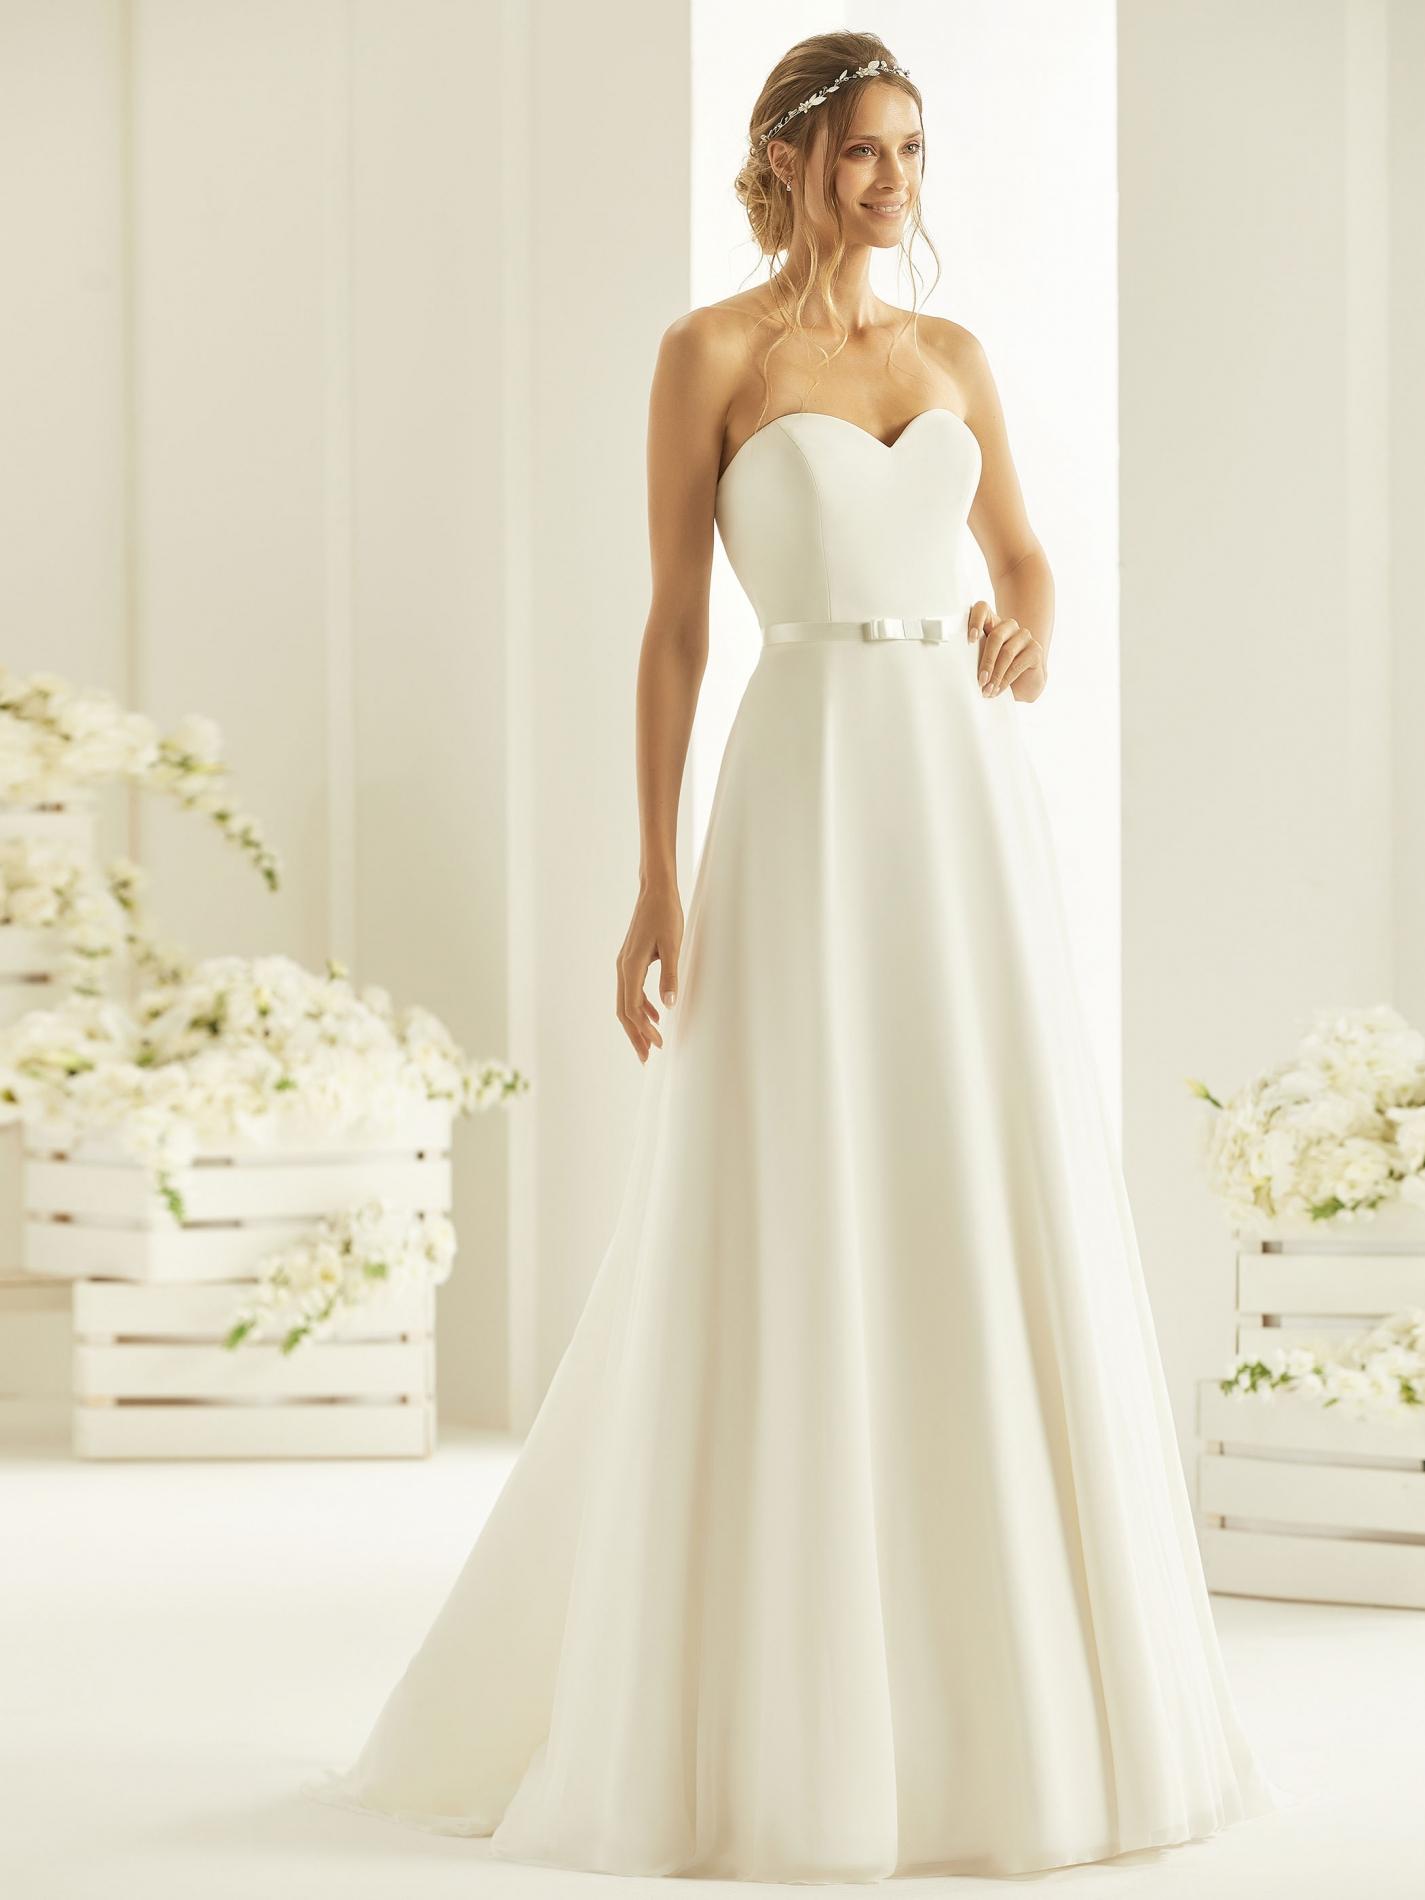 HARMONIA-(1) Bianco-Evento-bridal-dress (1)